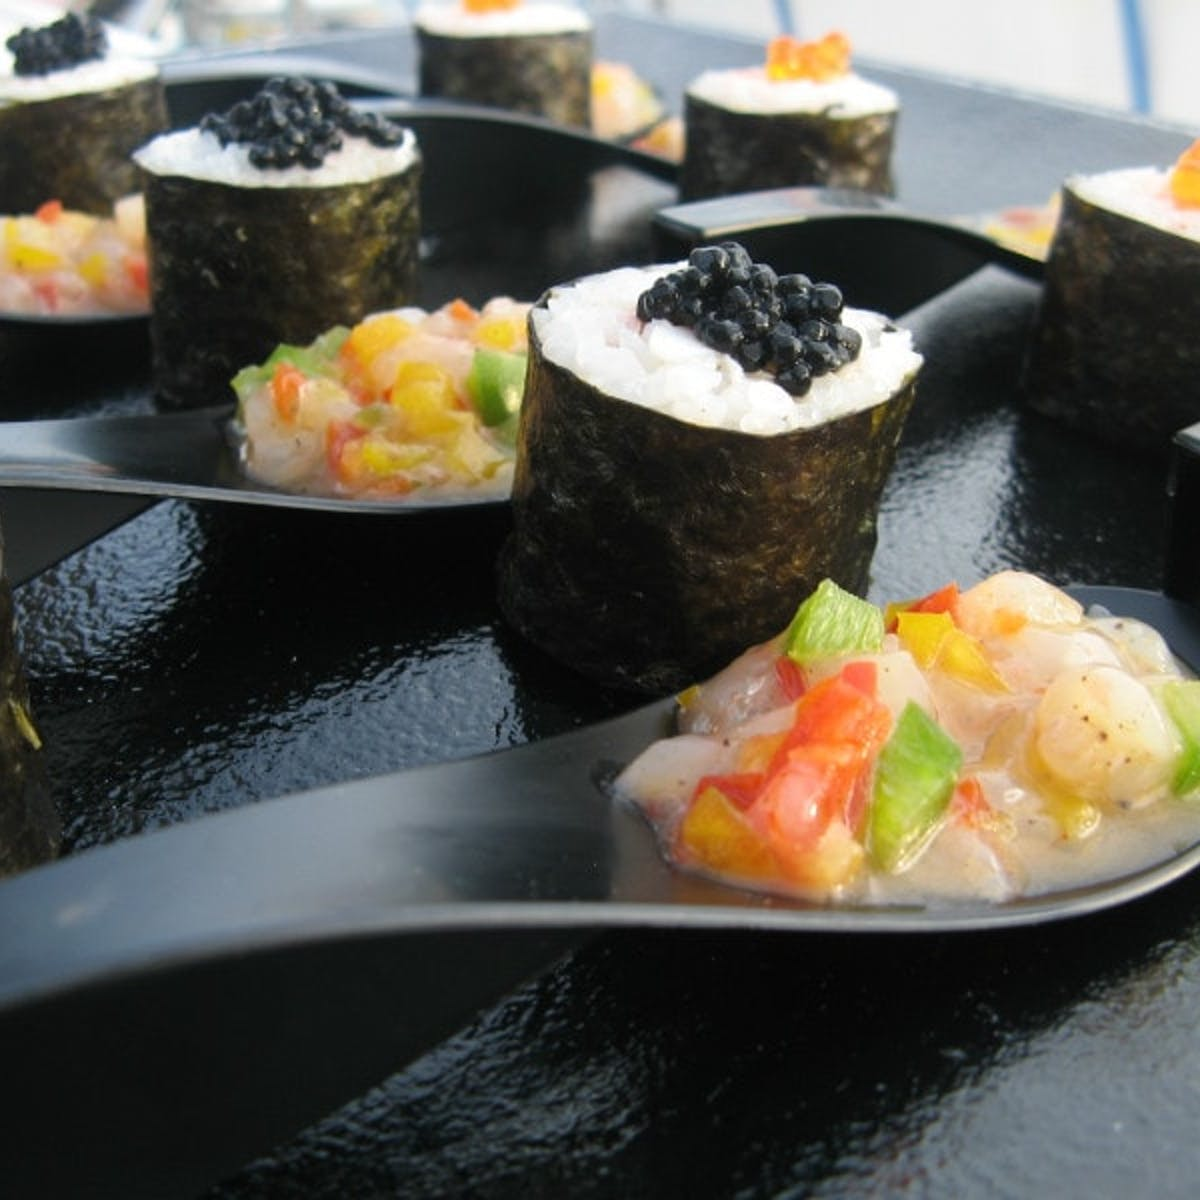 Sushi catering in Catamaran Orsom Barcelona